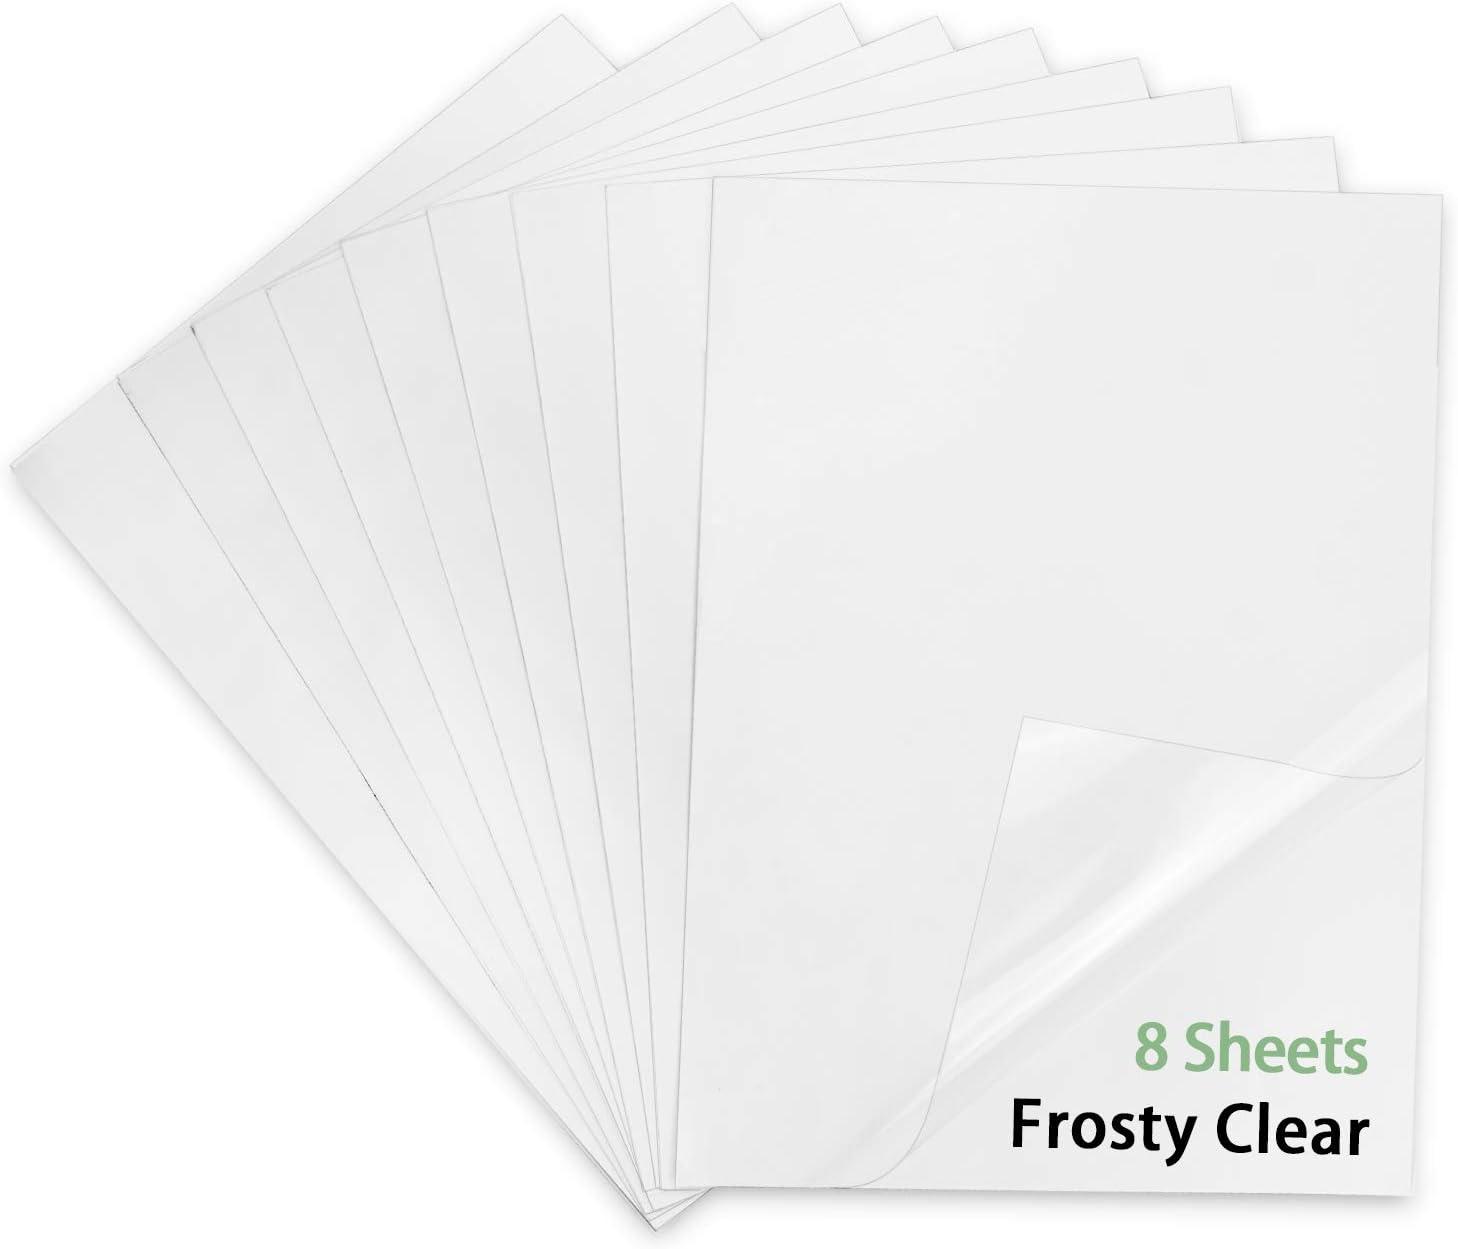 Printable Translucent Vinyl Sticker Paper for Inkjet Printer-8.5 X 11 Waterproof Sticker Paper 8 Sheets